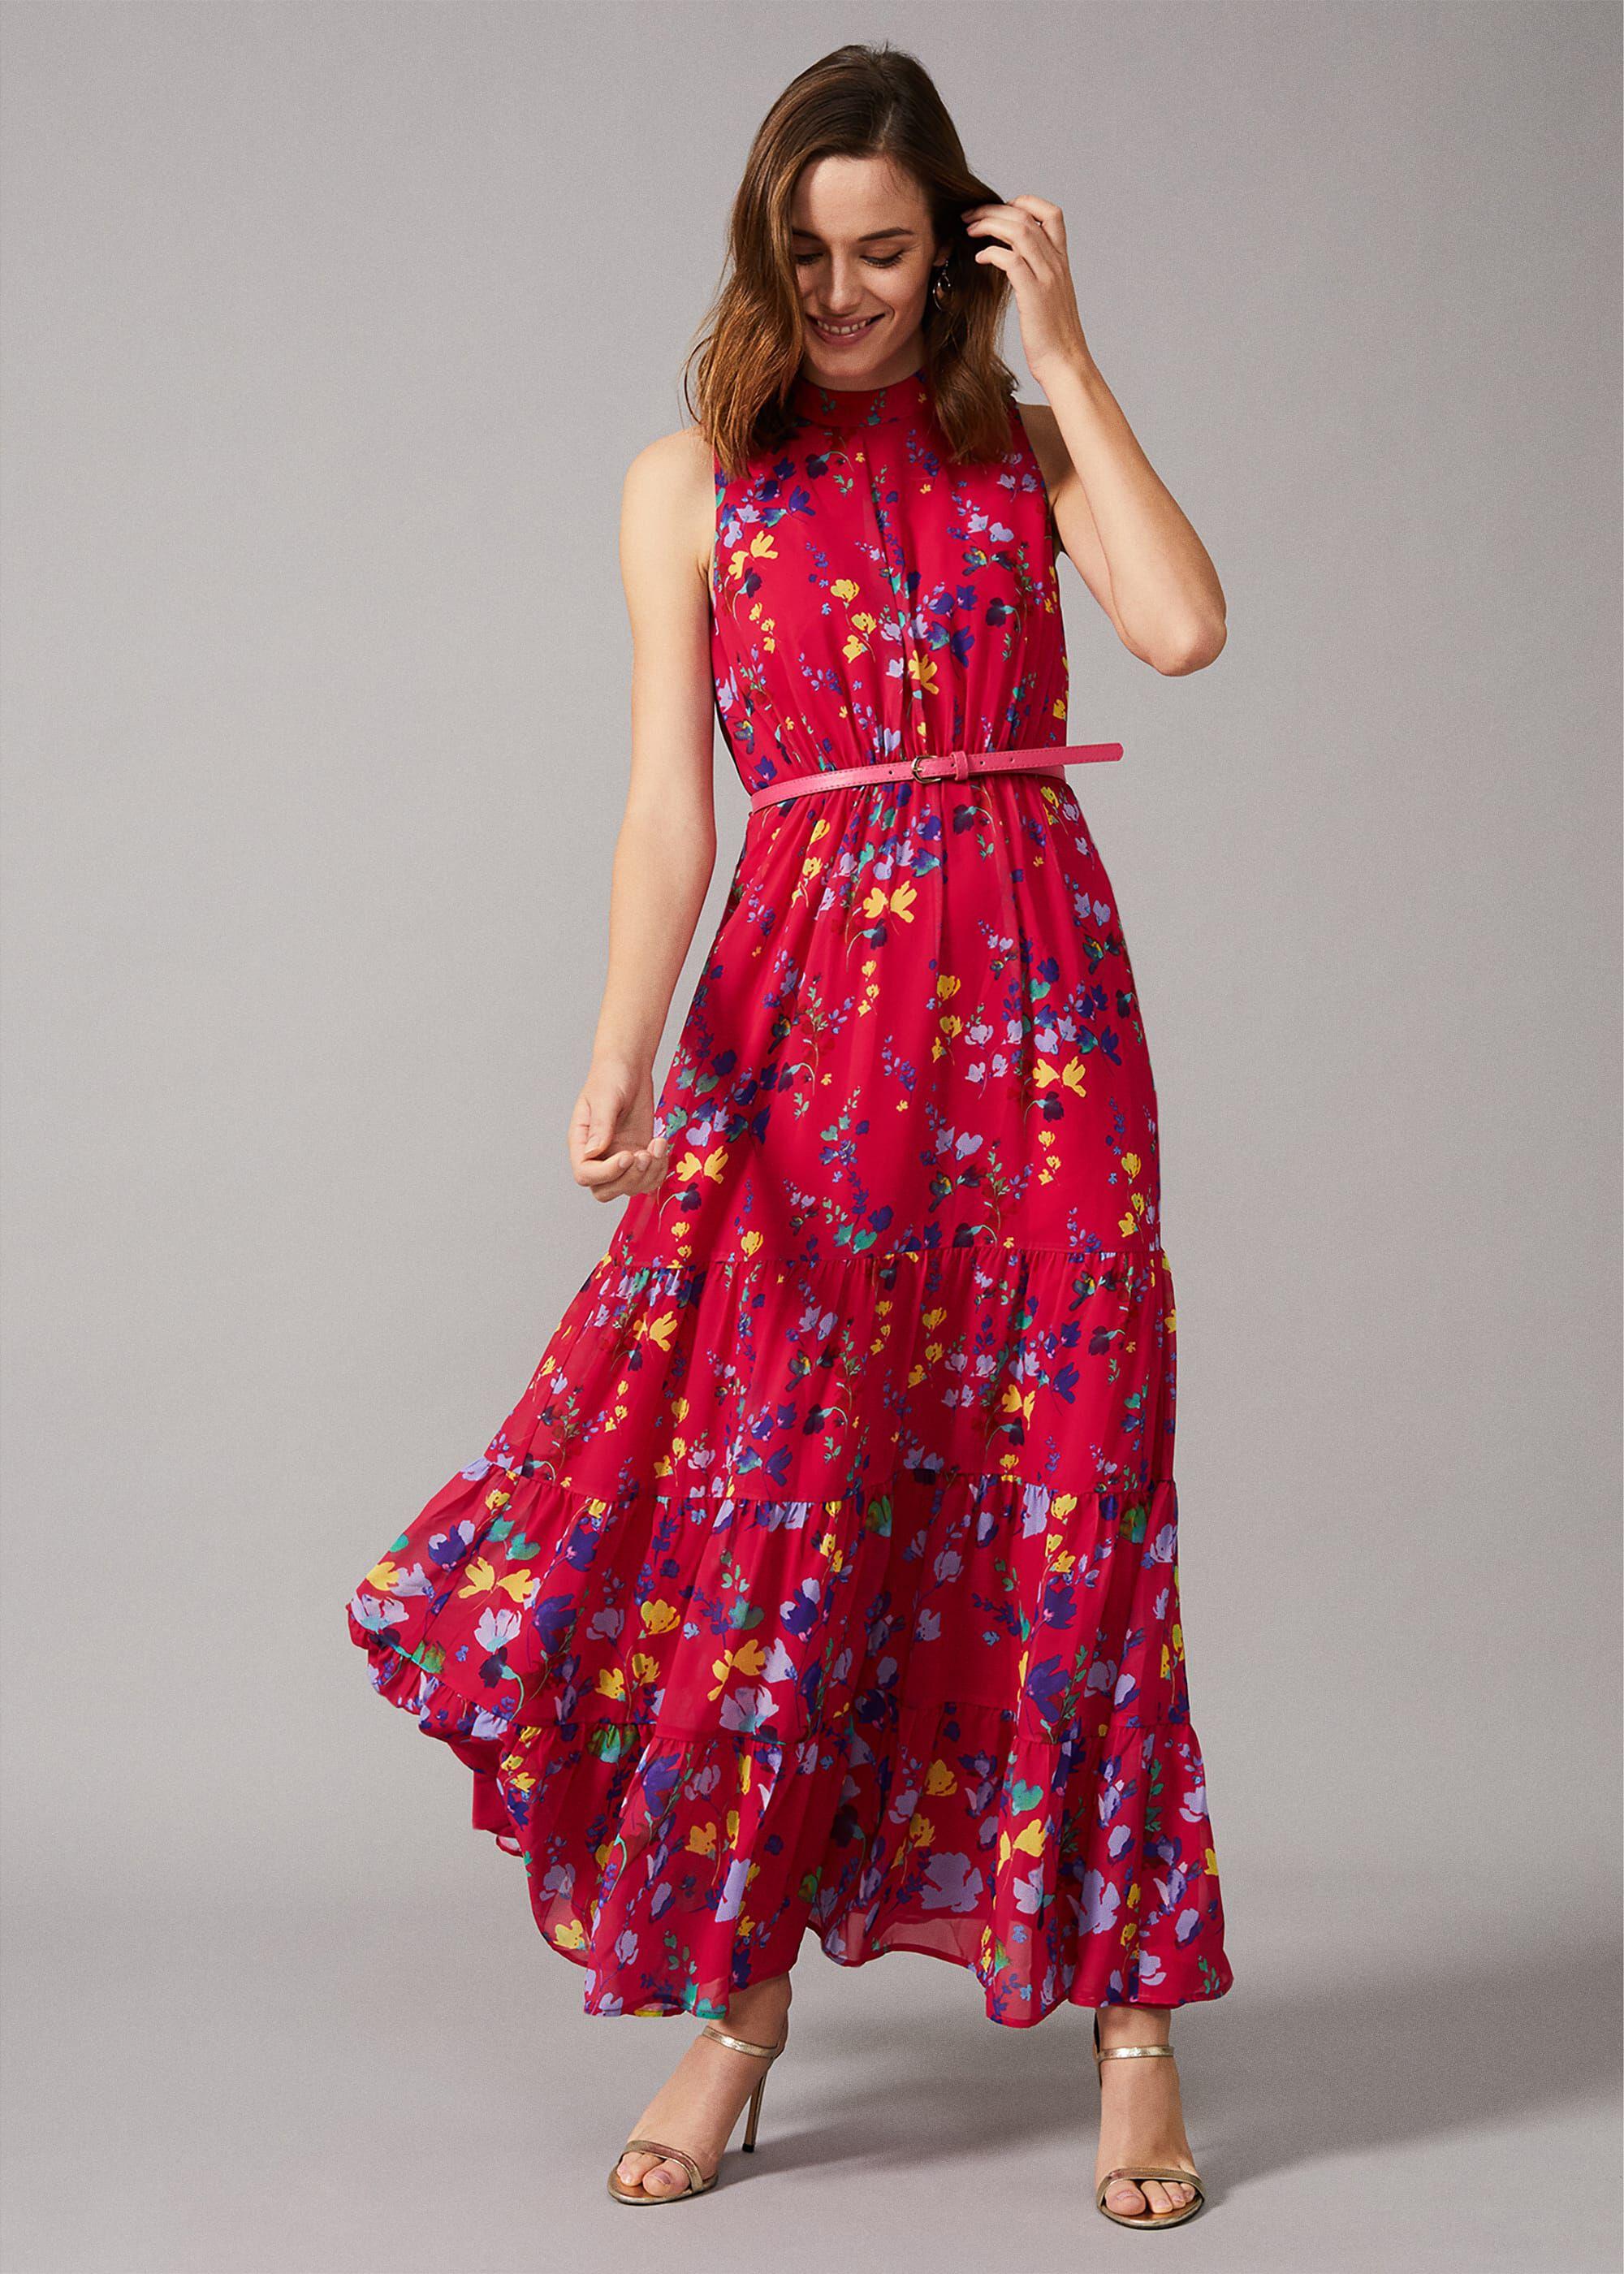 PHASE EIGHT Ditsy Black Floral Halterneck Swimsuit Size UK 10 12 14 16